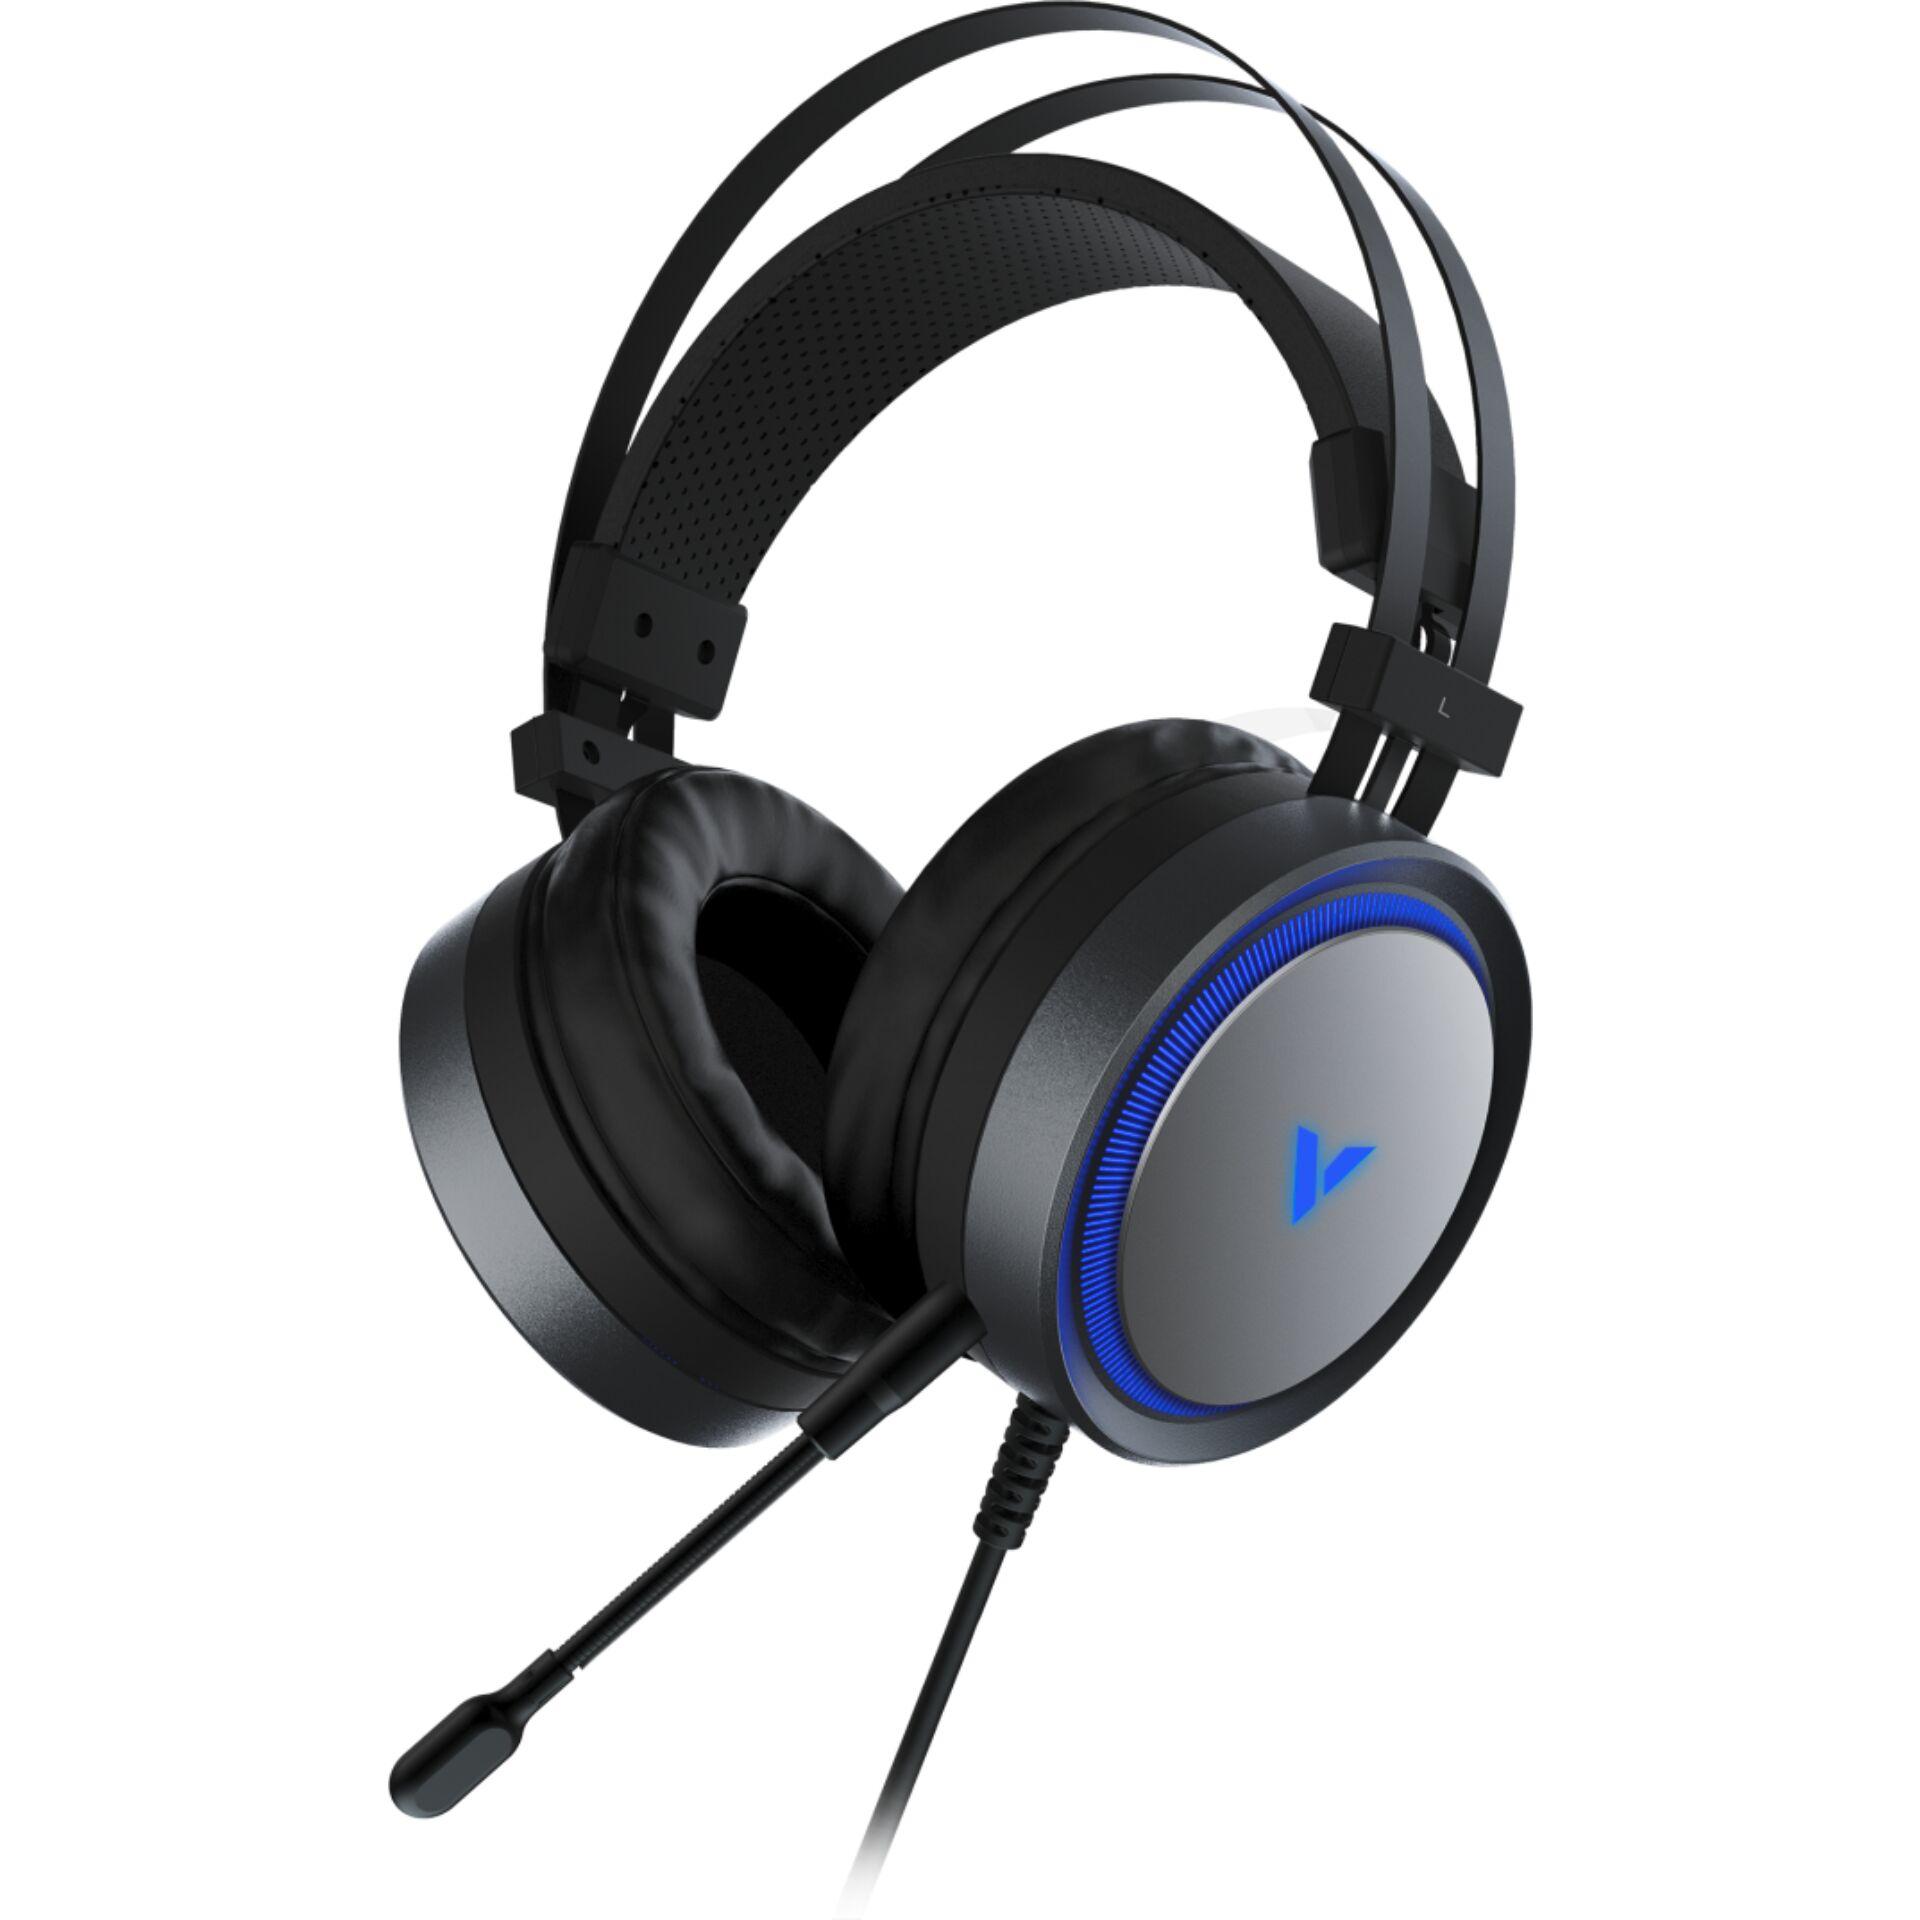 Rapoo VPro VH530 Gaming Headset, Virtual 7.1